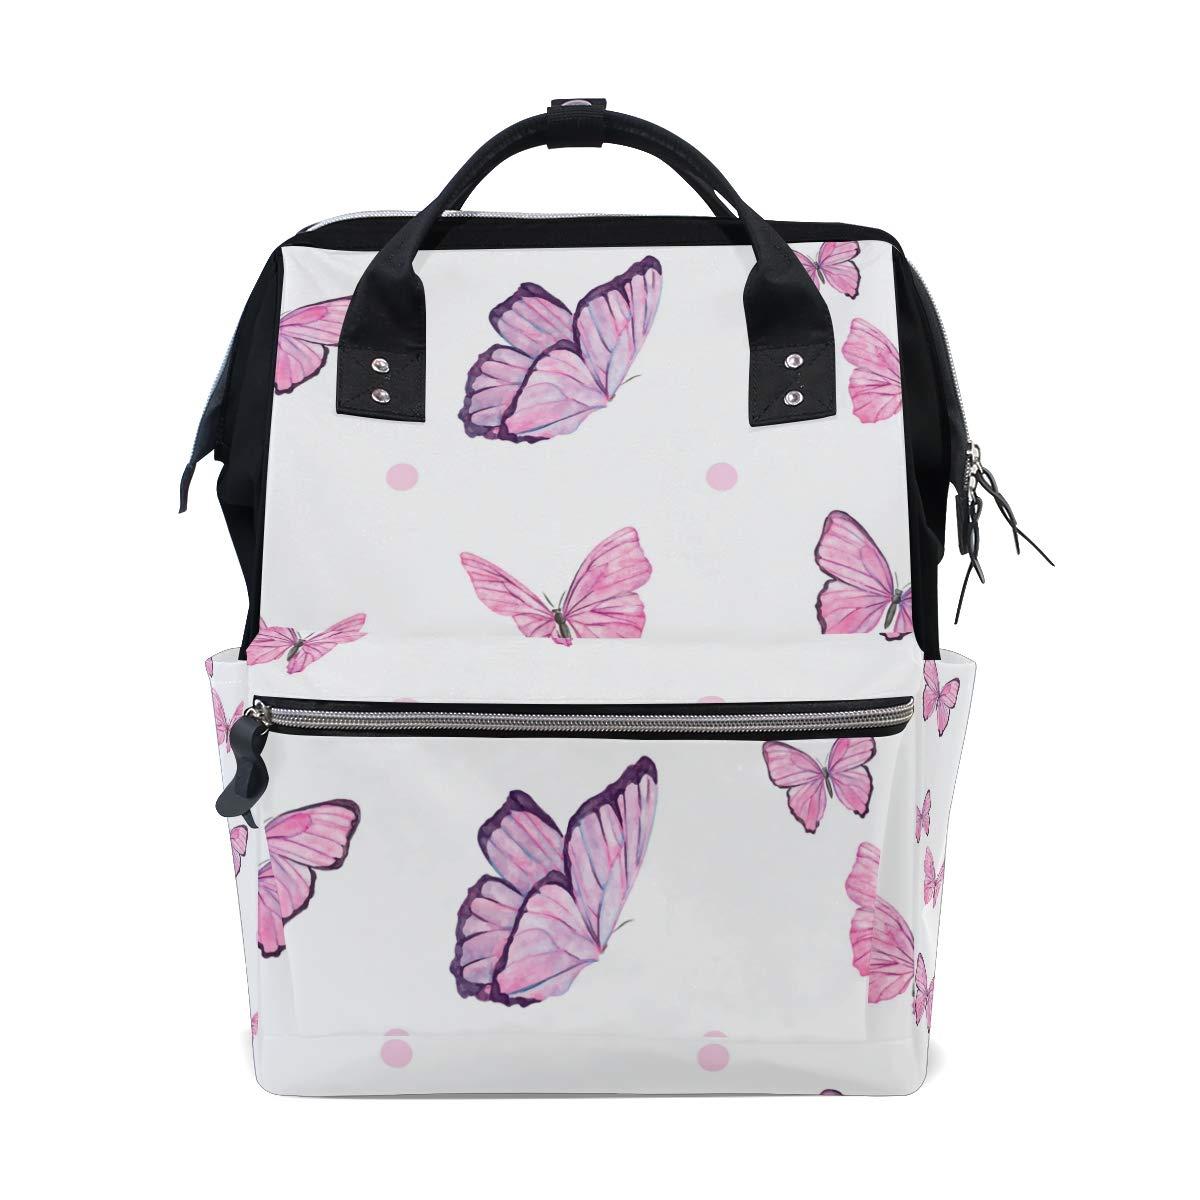 MALPLENA Daypack Pink Flying Butterfly School Bag Travel Backpack